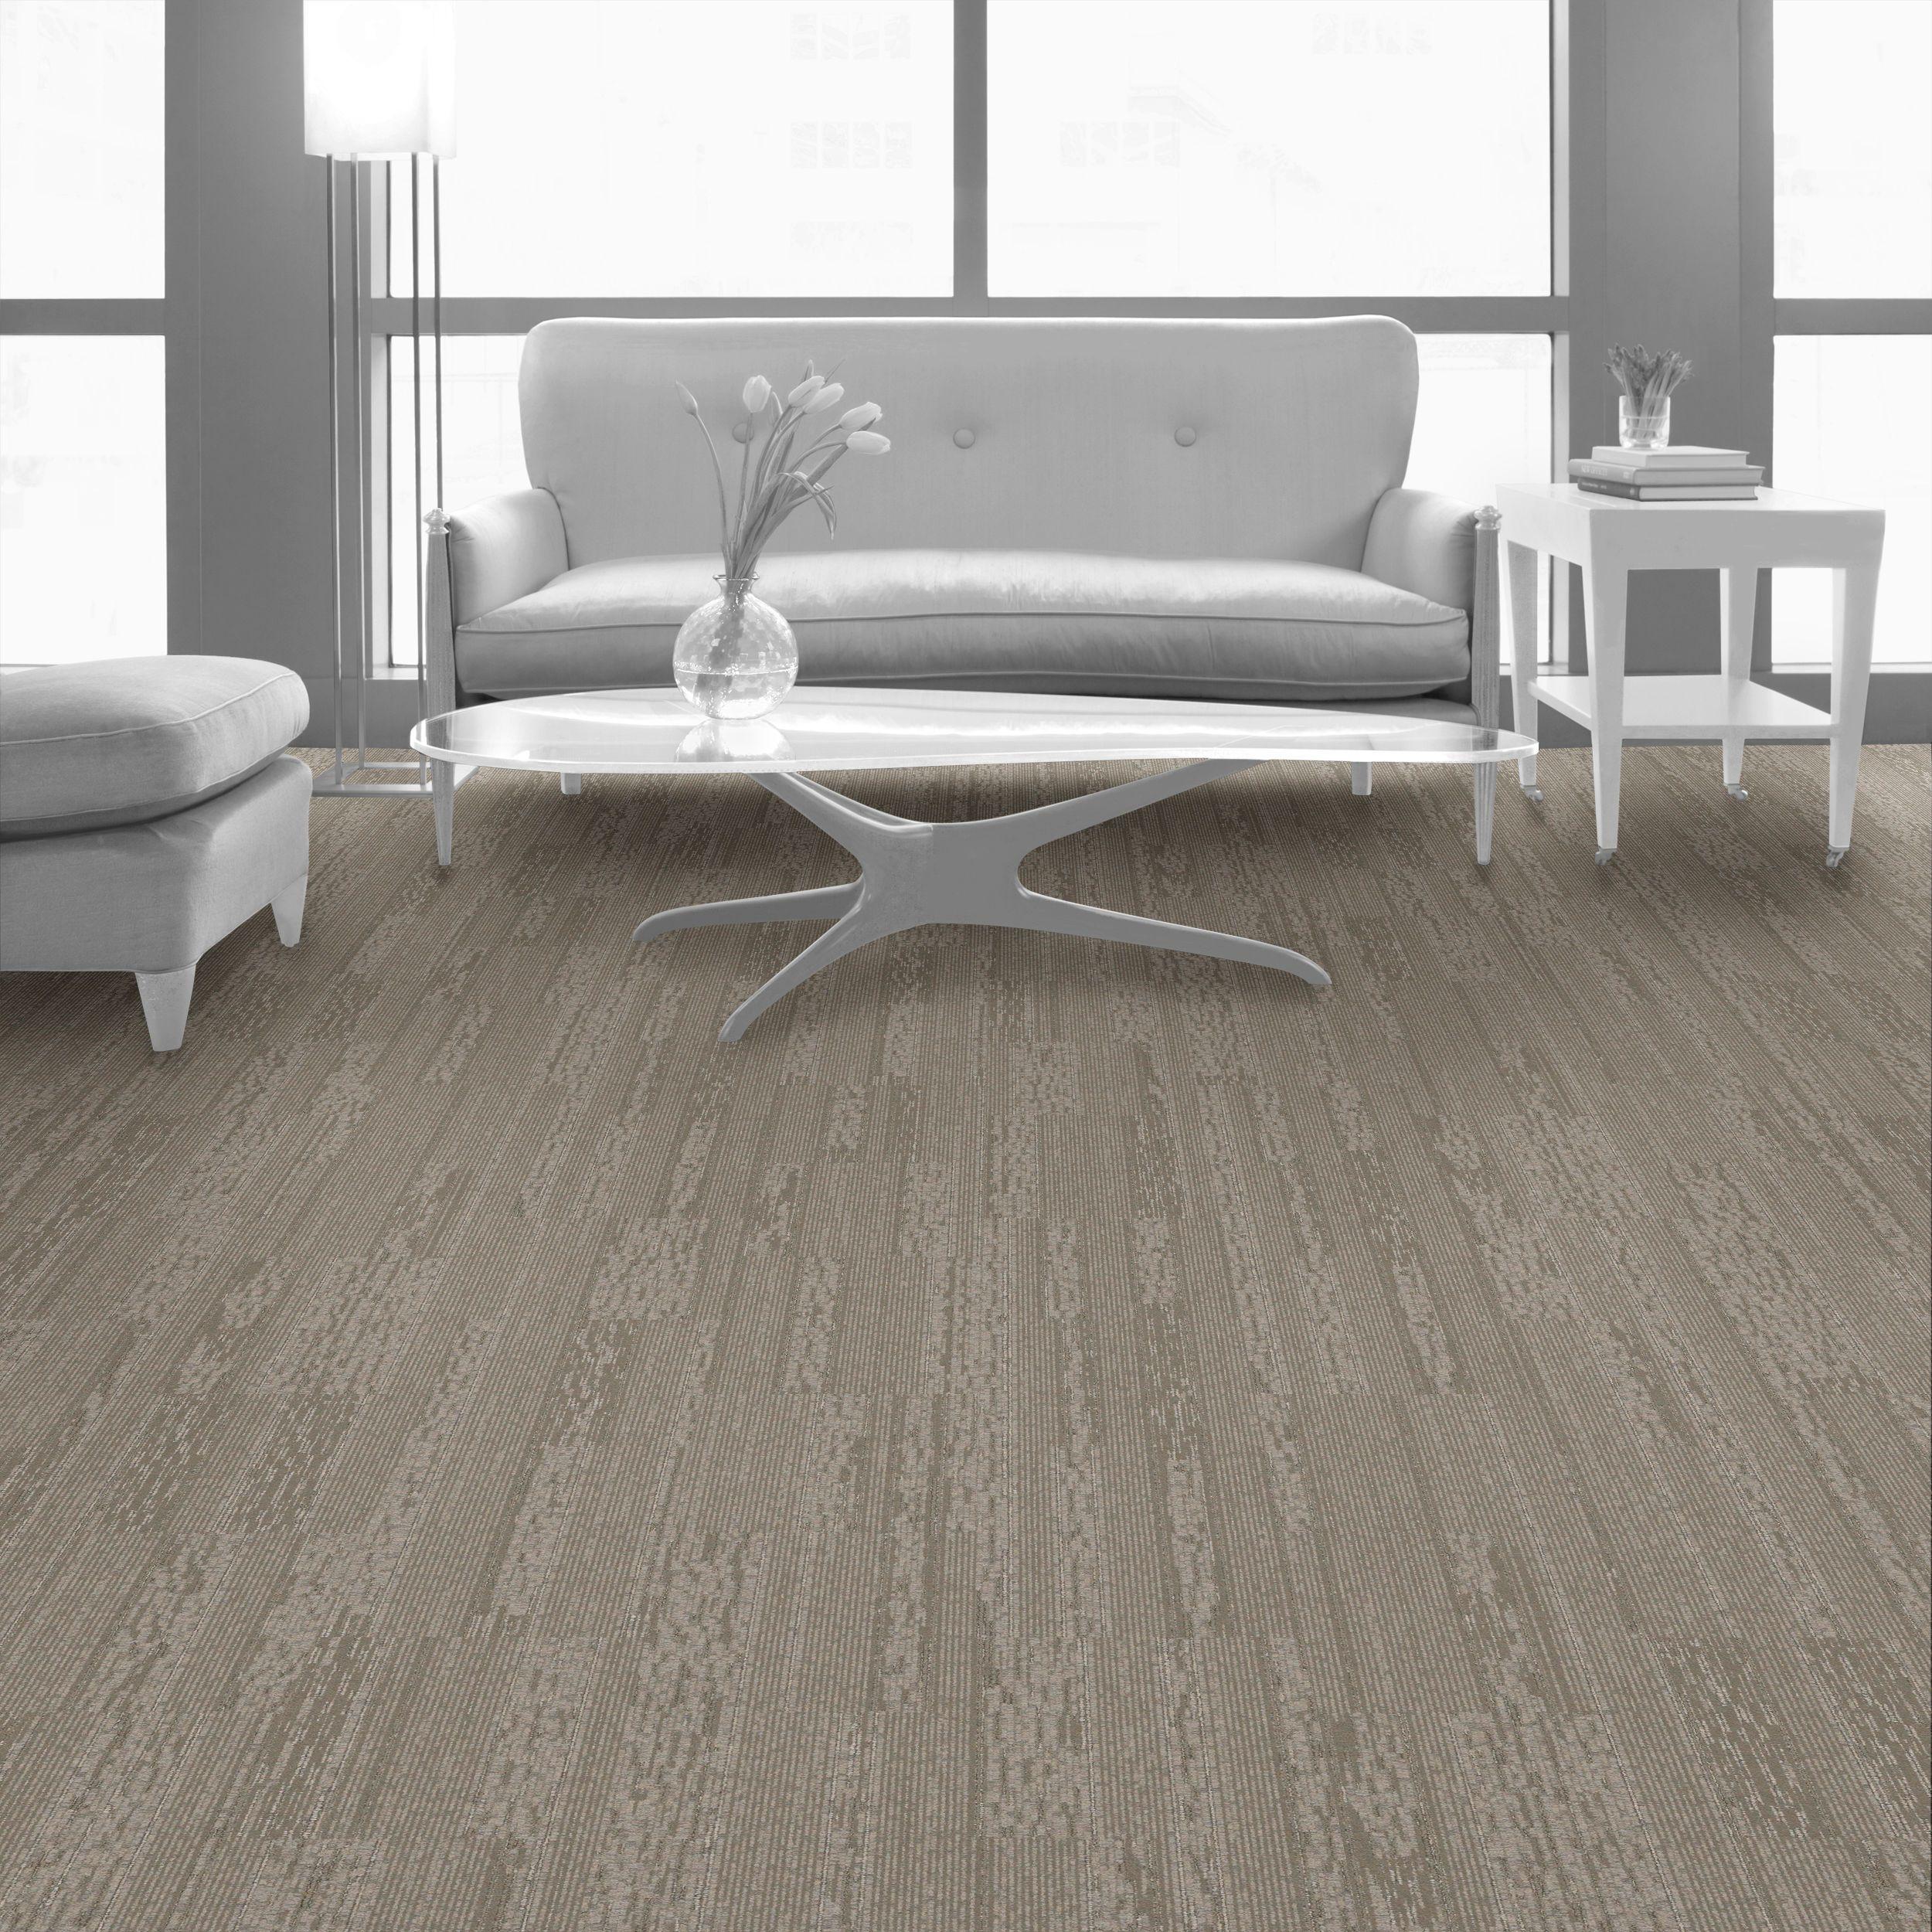 Interface posh skinny plank tile carpet color corfu interface carpet tile panorama ii color topaz 9687 installation method non directional room scene lounge baanklon Gallery